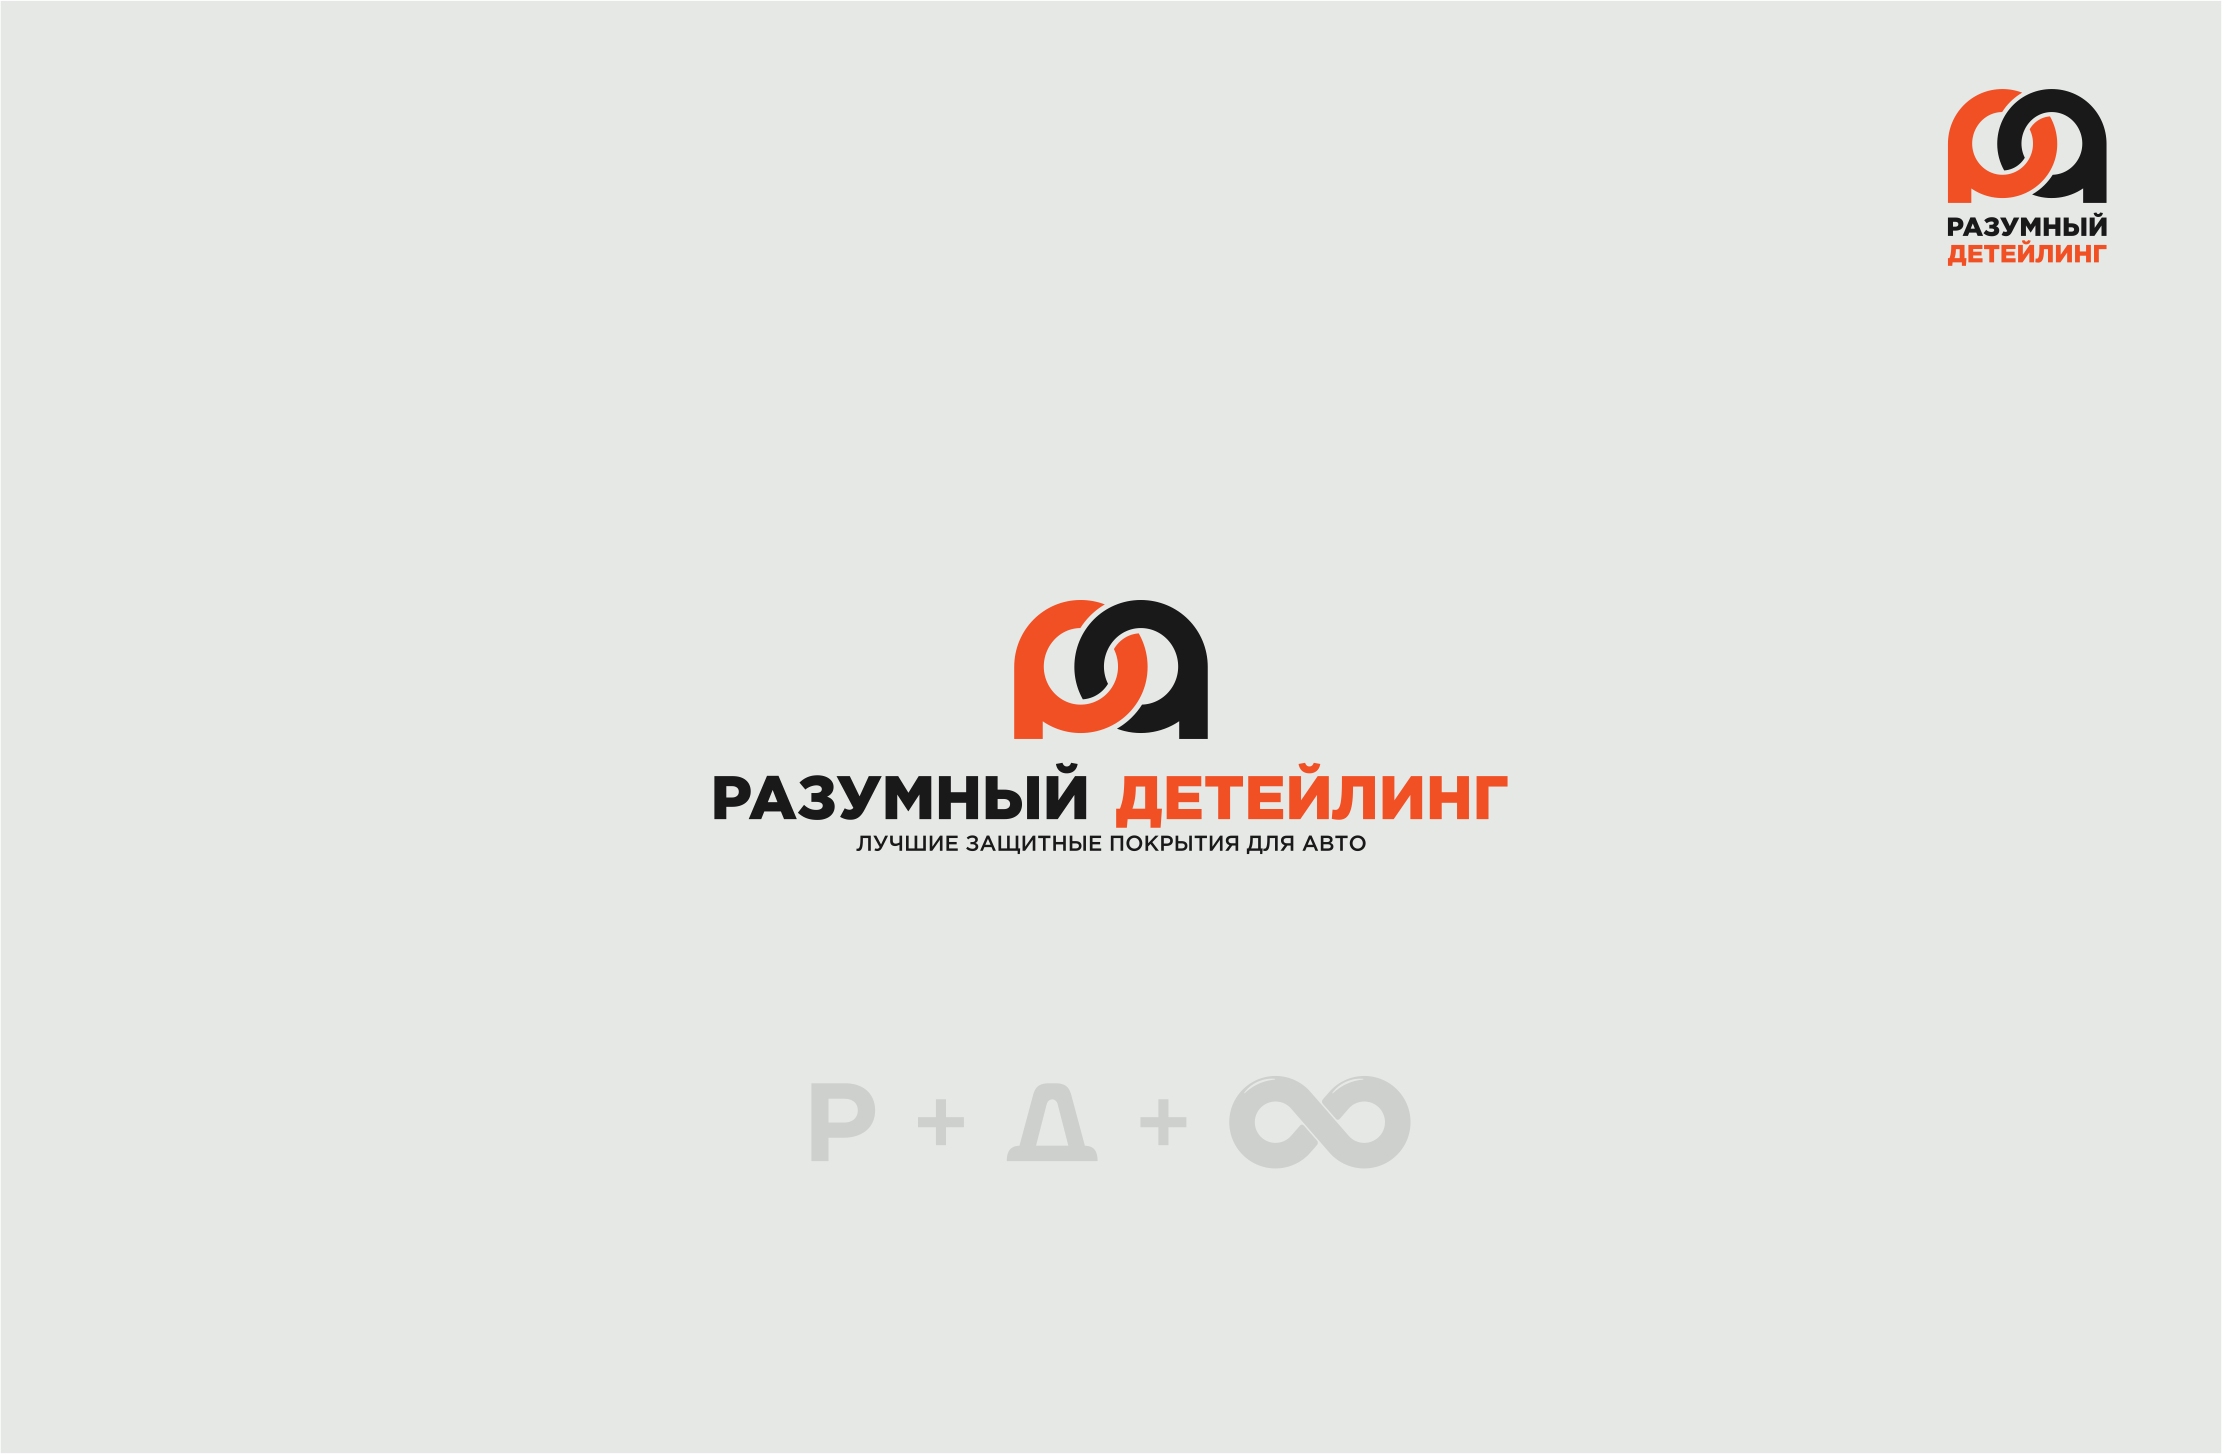 Ребрендинг логотипа  фото f_5185aef19bc35c34.png